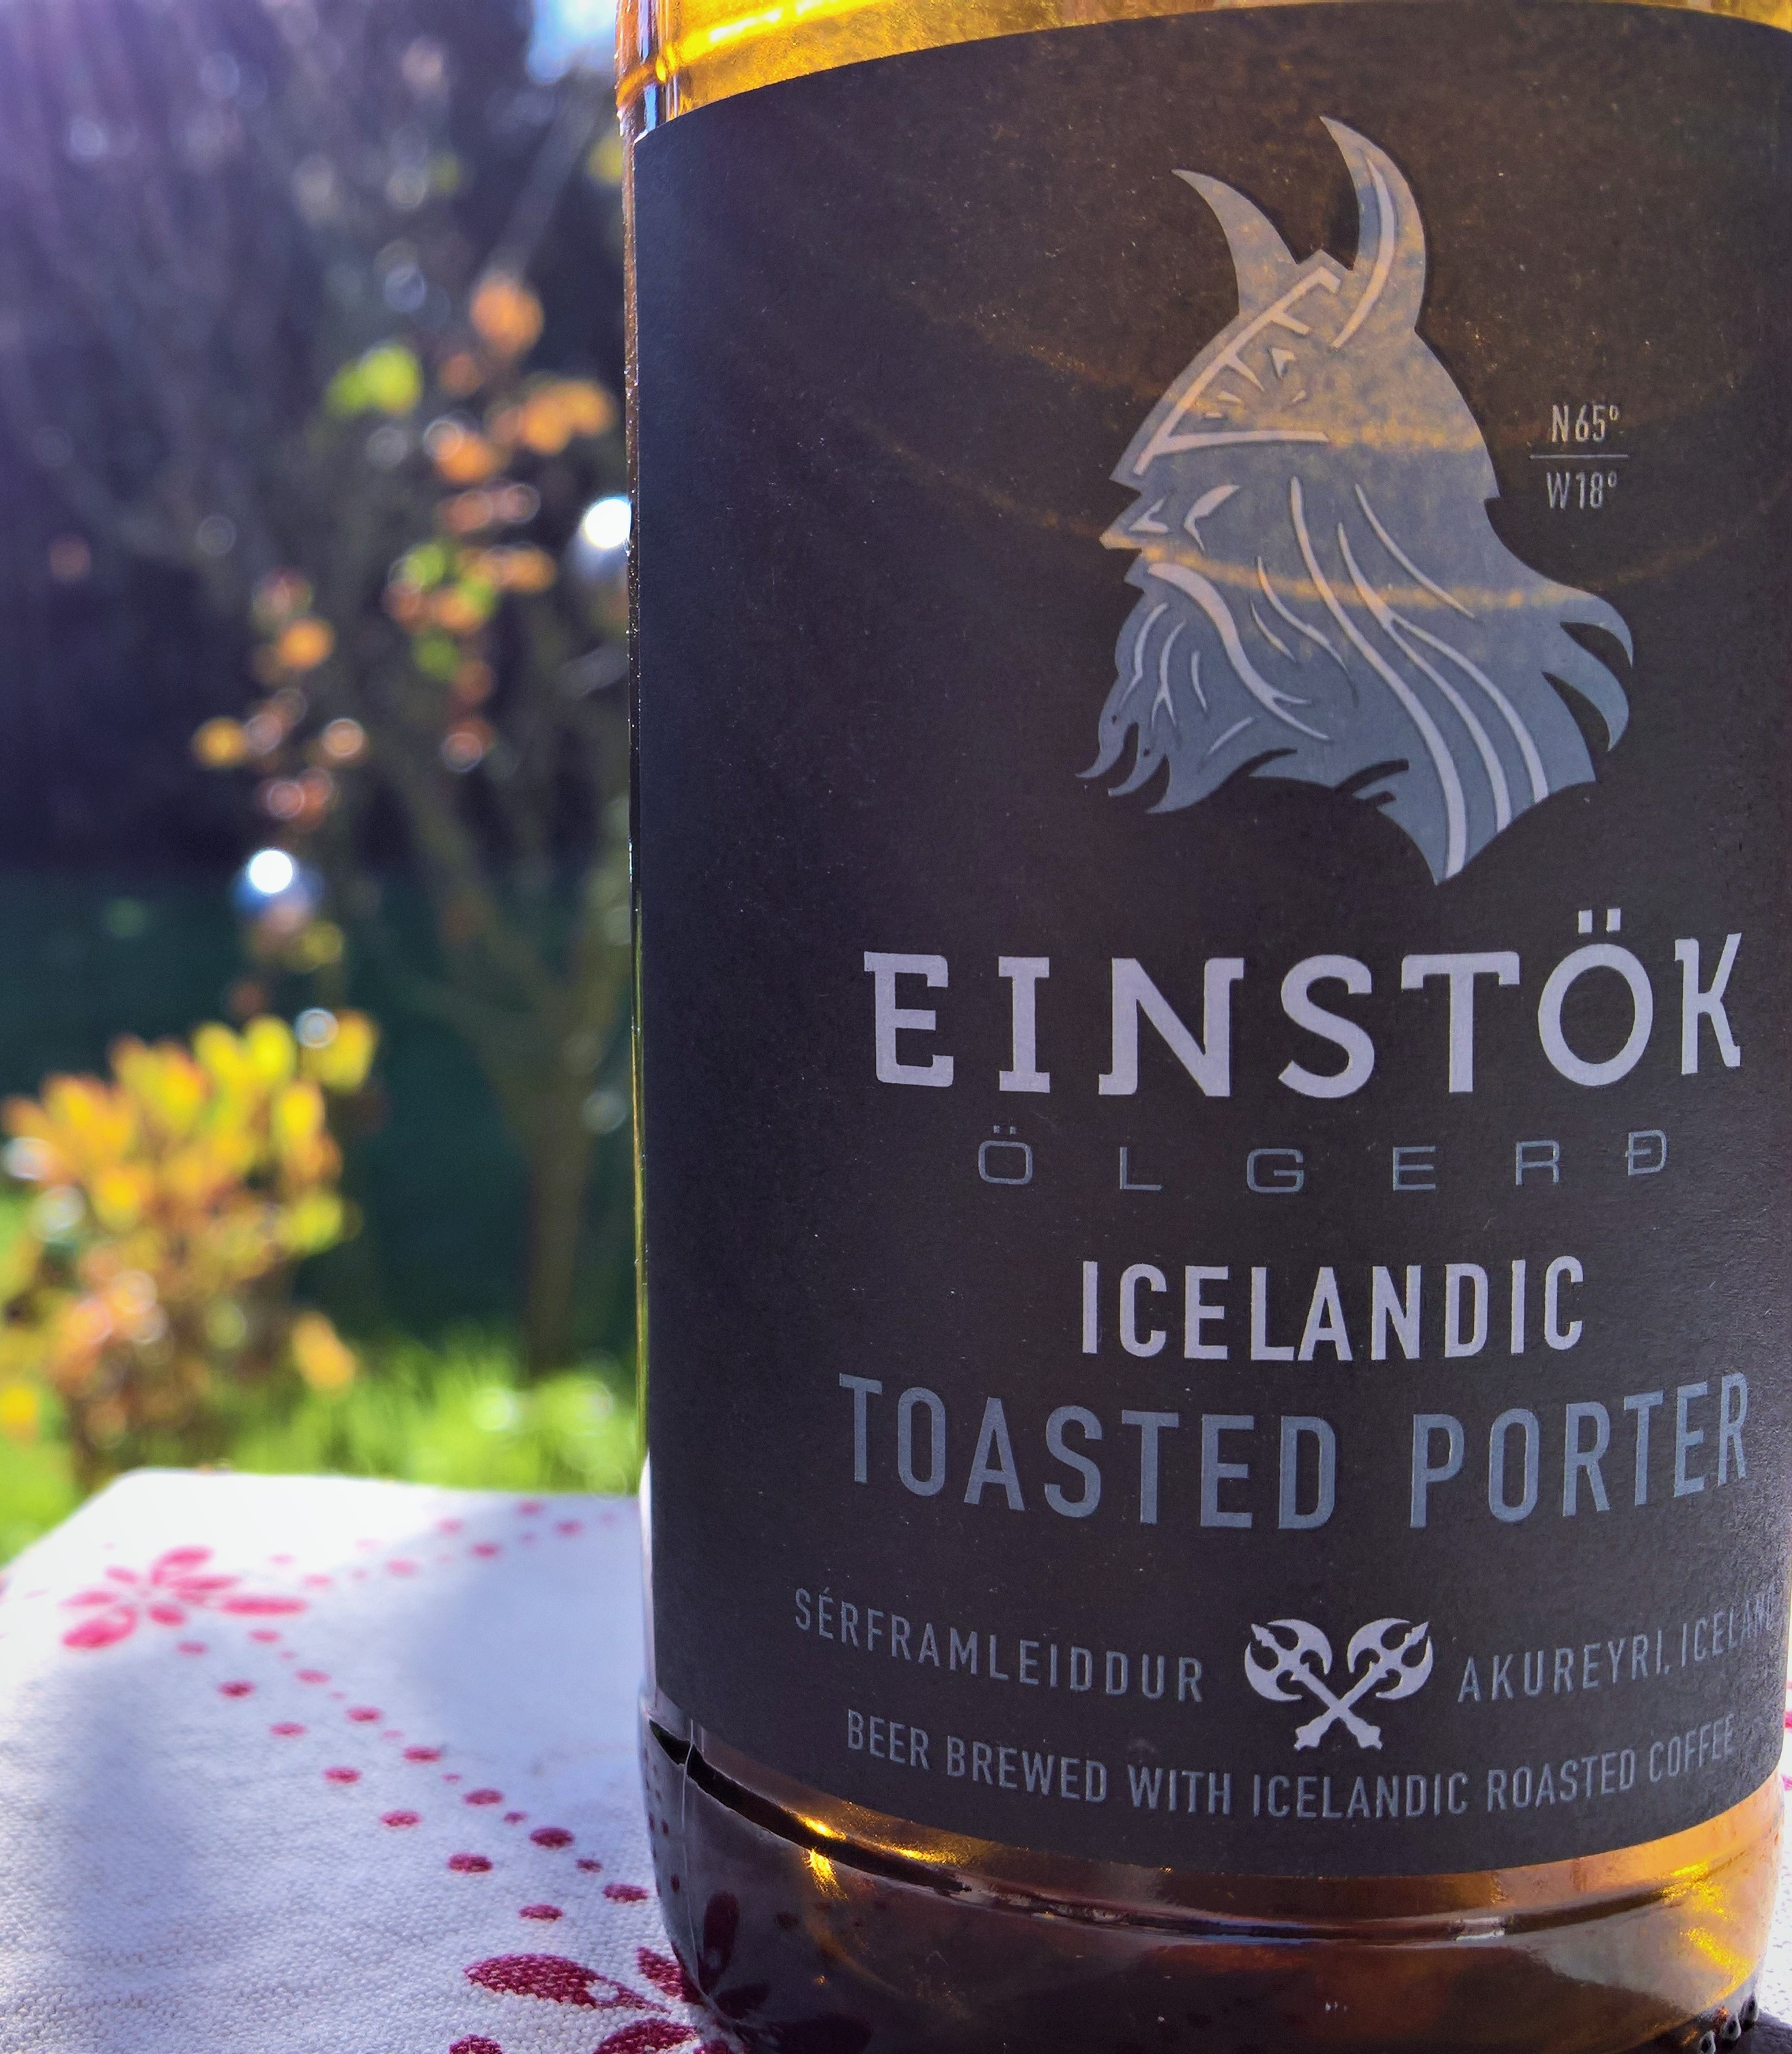 einstoek-toasted-porter